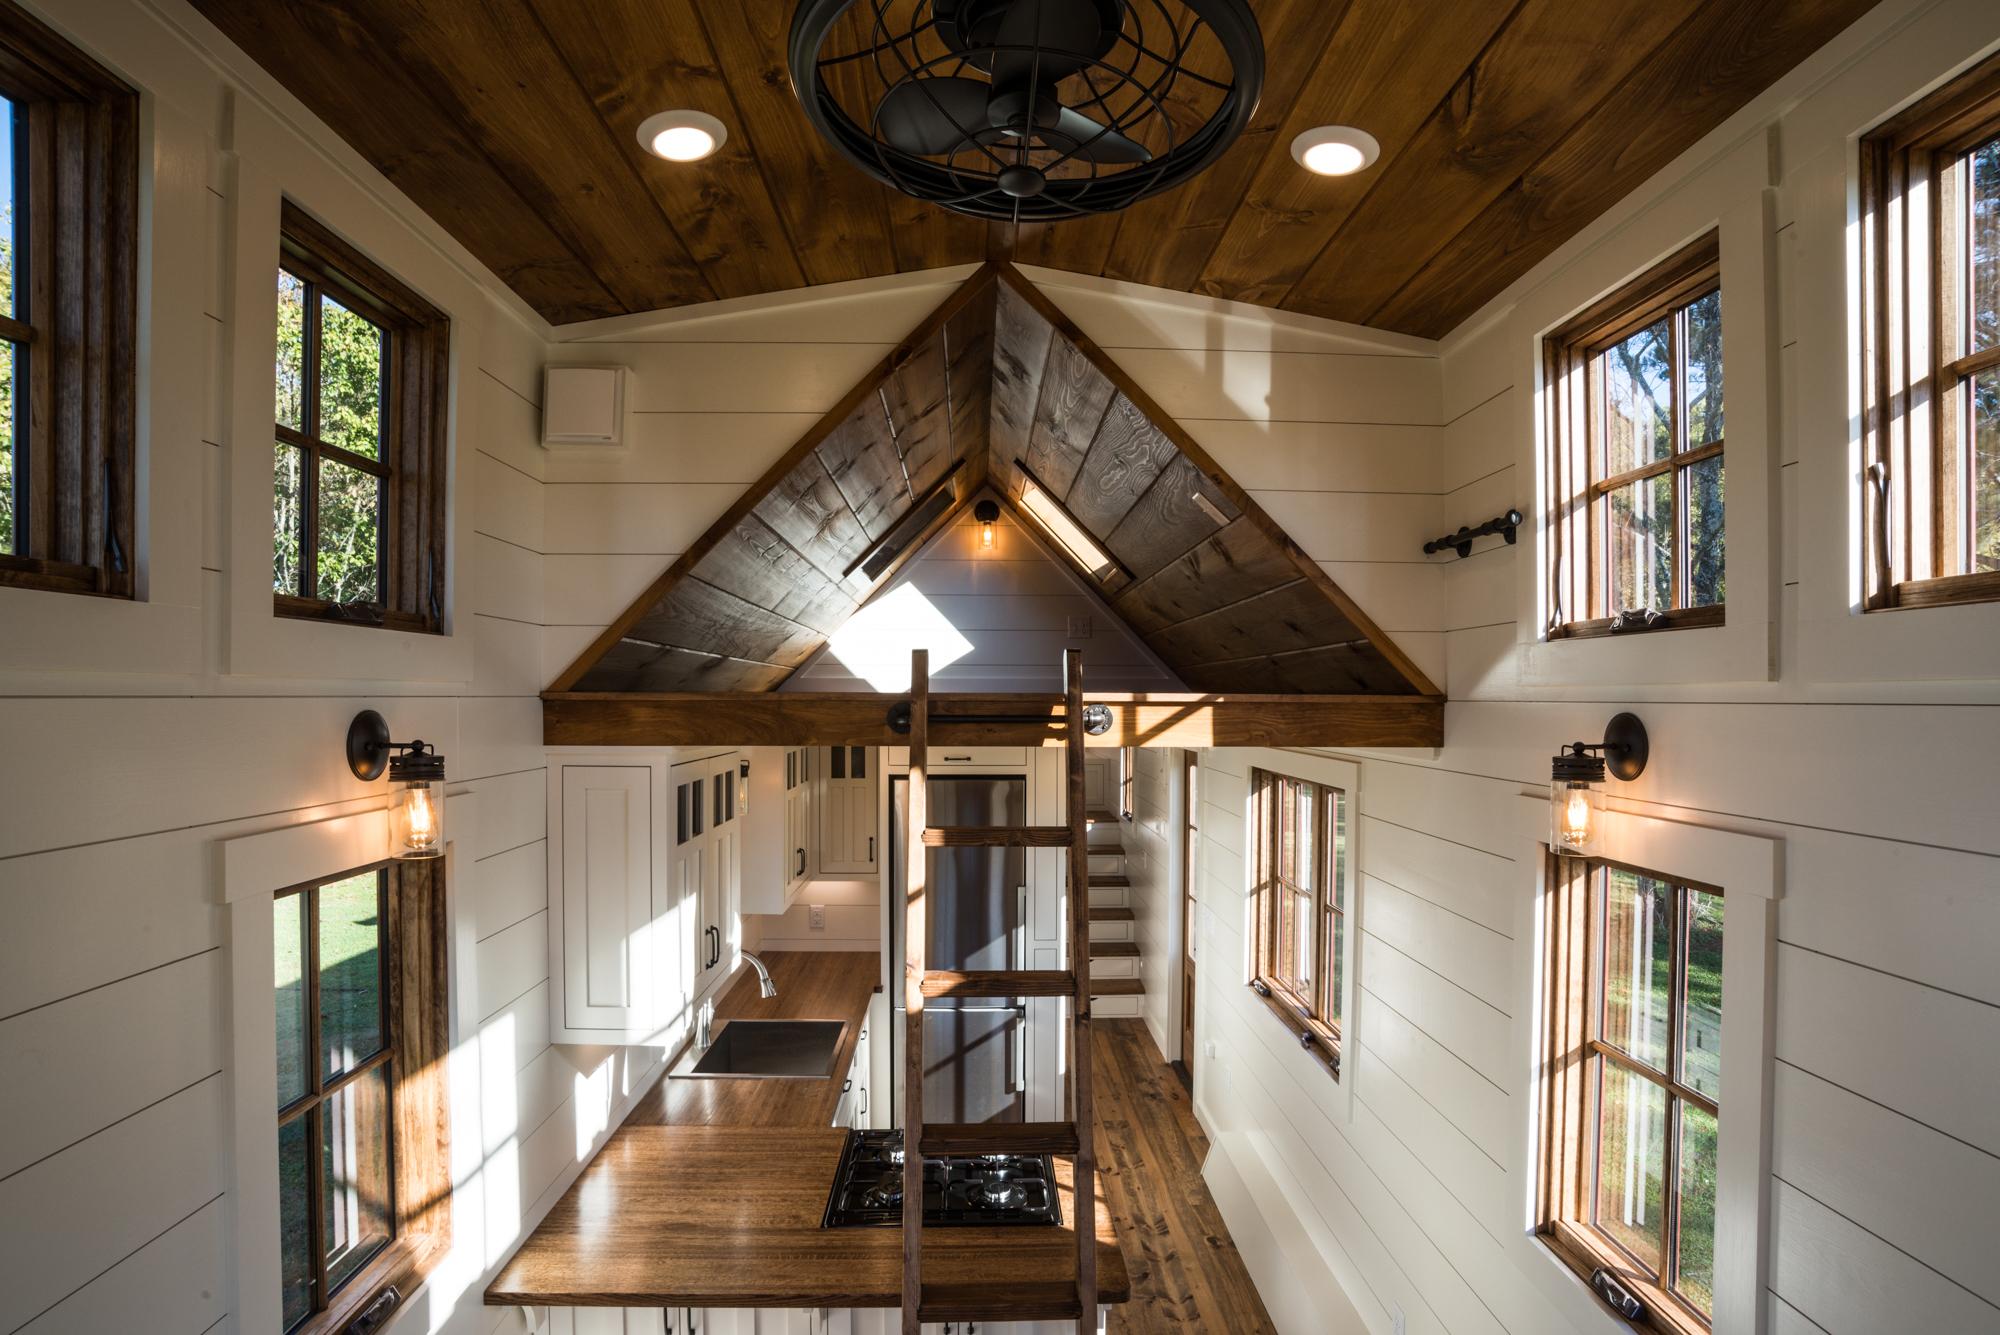 Fullsize Of Timbercraft Tiny Homes